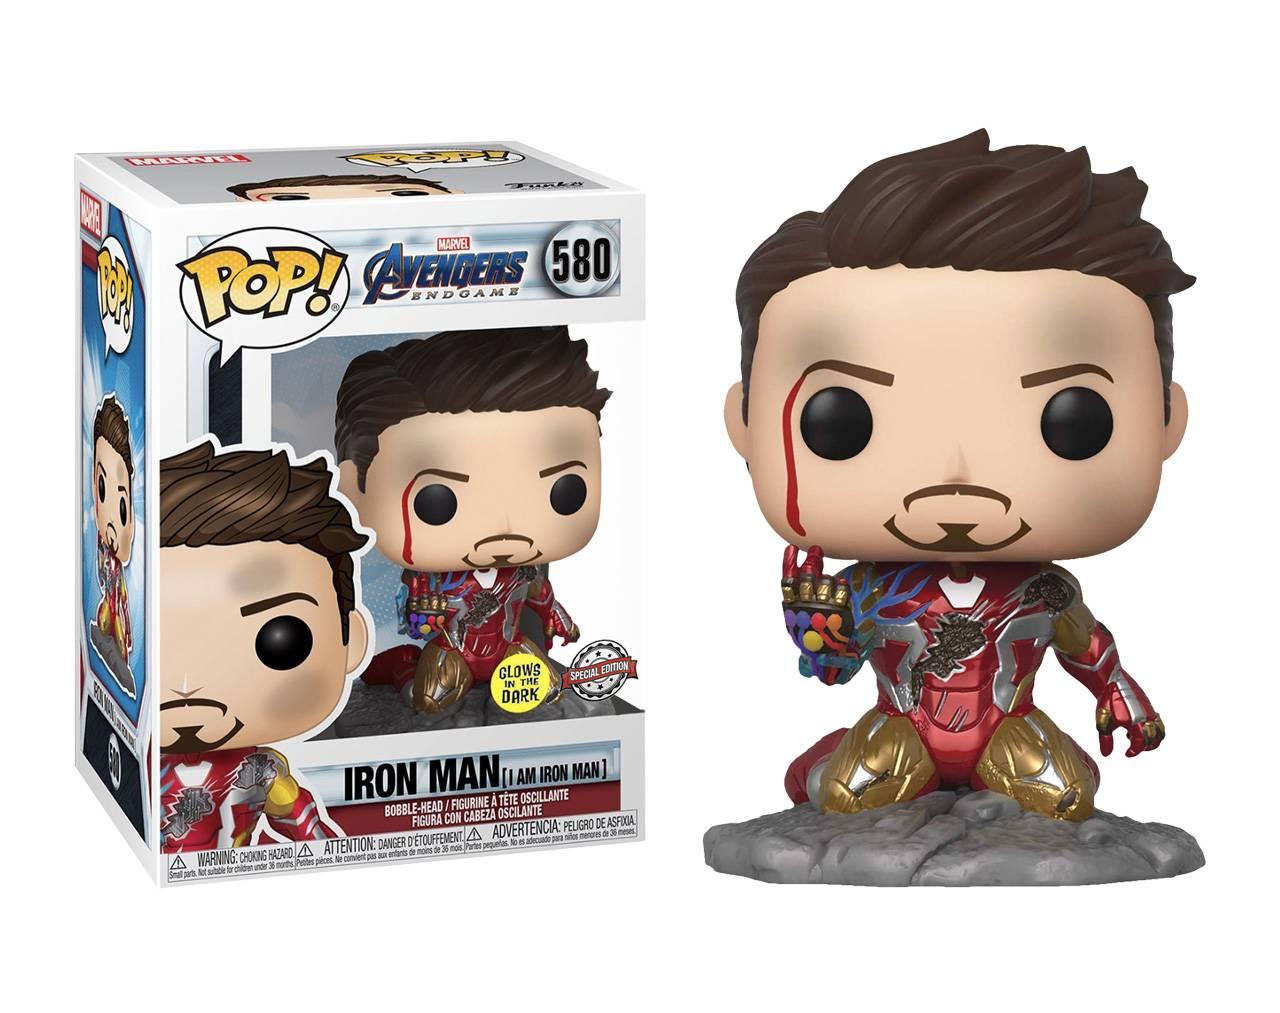 Iron Man (GITD) Pop! Vinyl